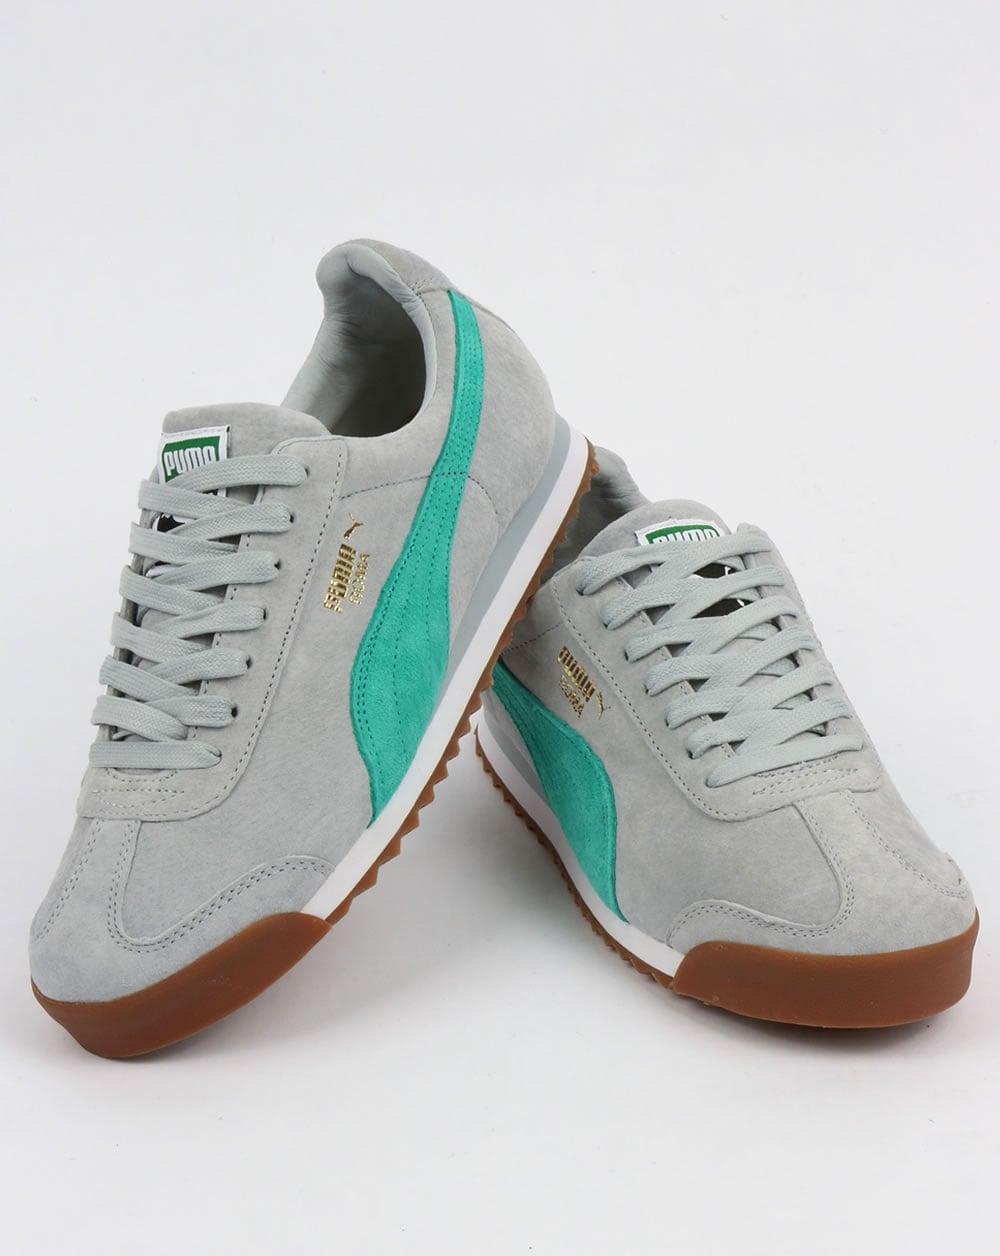 8830df3b5e5db Puma Roma Trainers Blue/Green/White